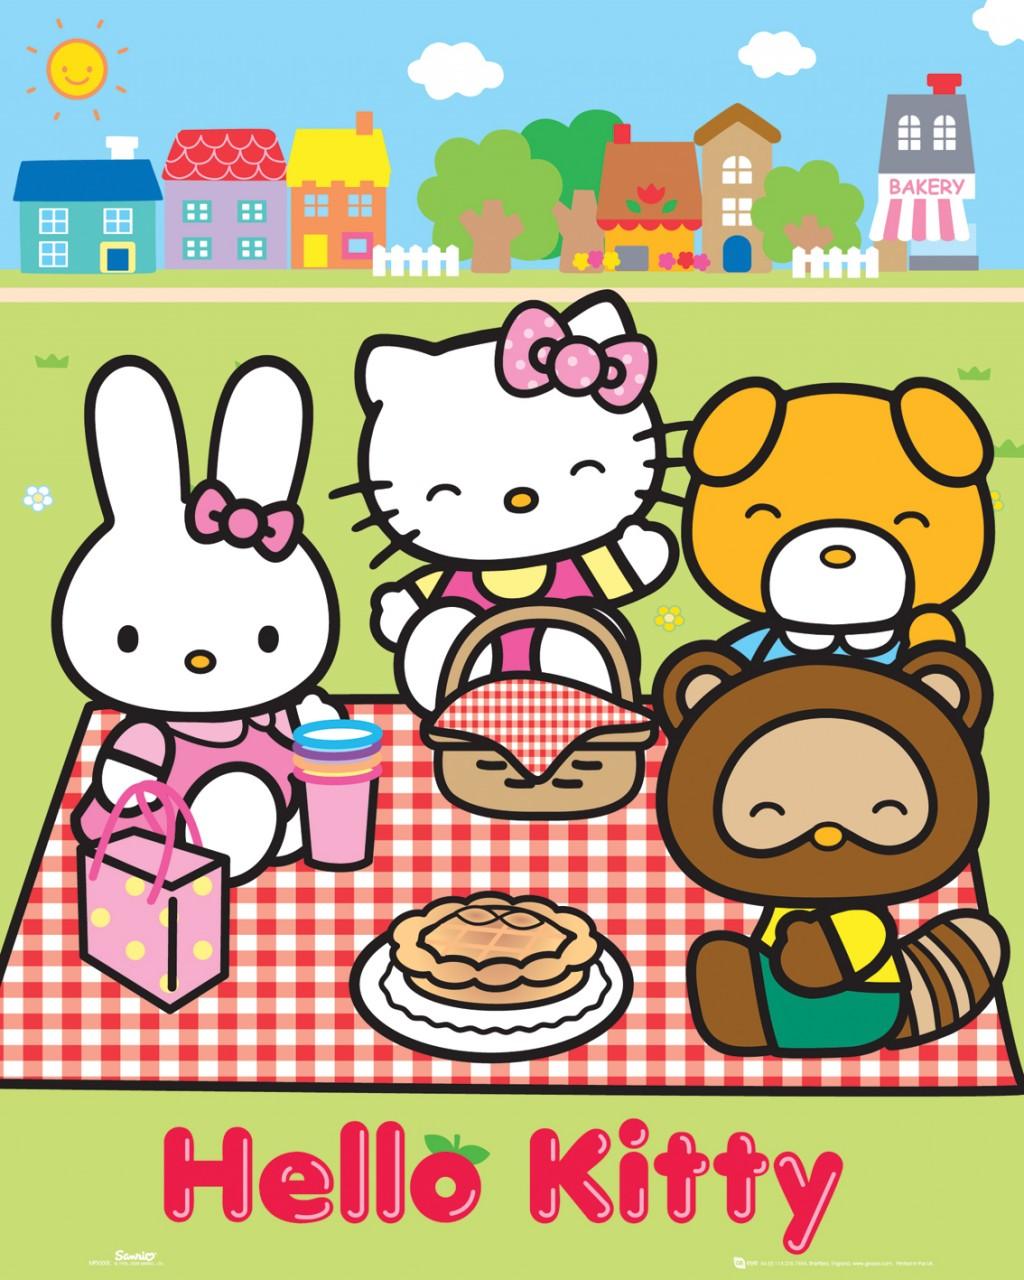 Kawaii Blush: A Picnic With Hello Kitty